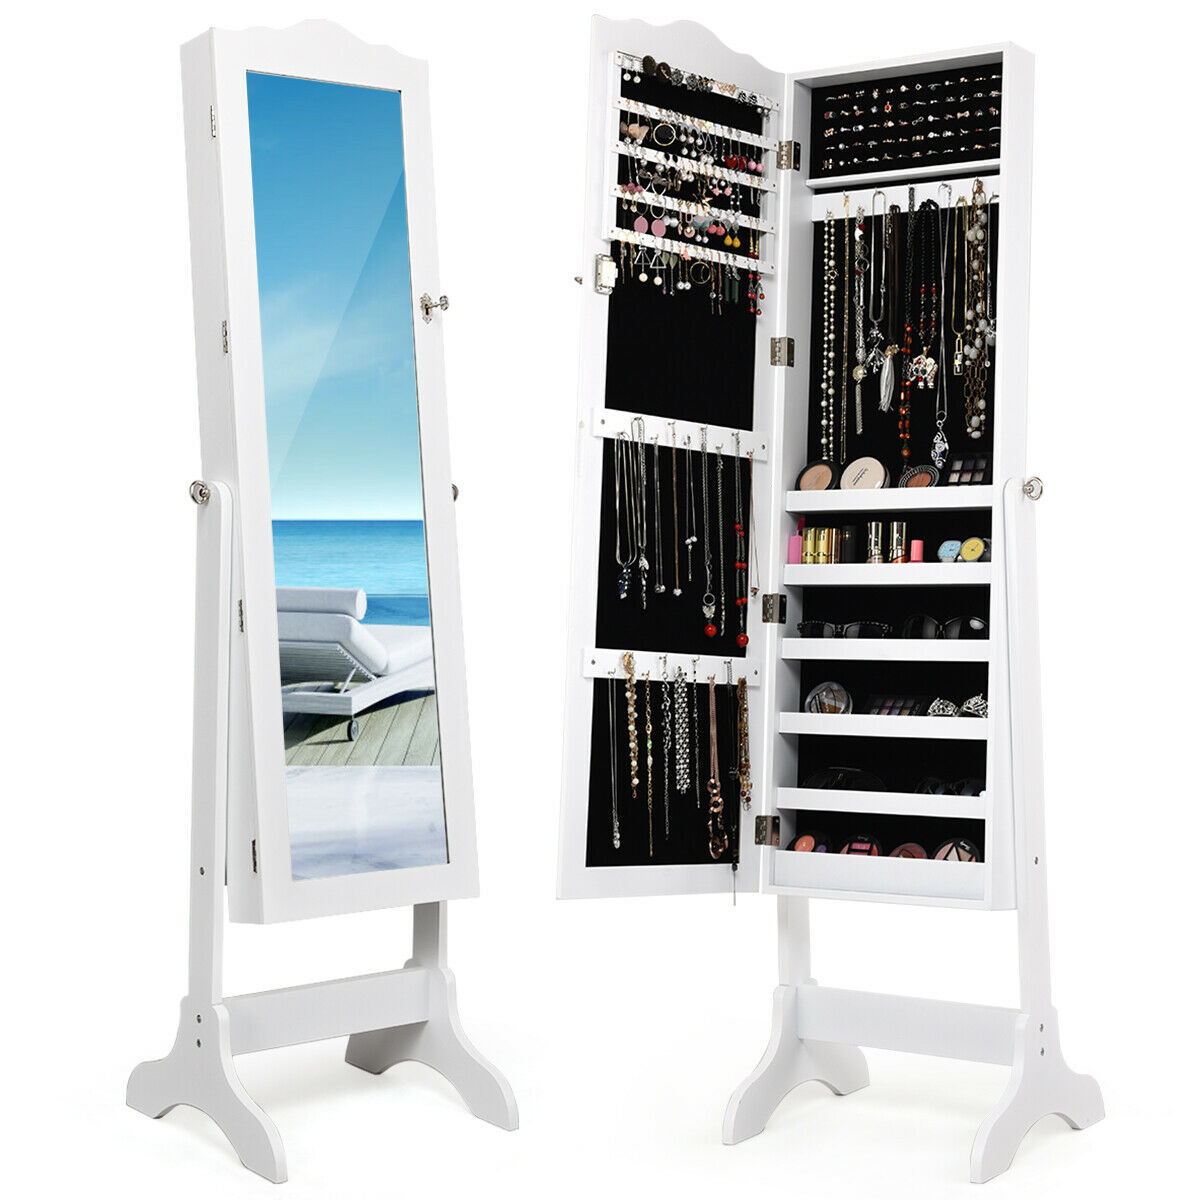 costway lockable mirrored jewelry cabinet armoire mirror organizer storage box w stand